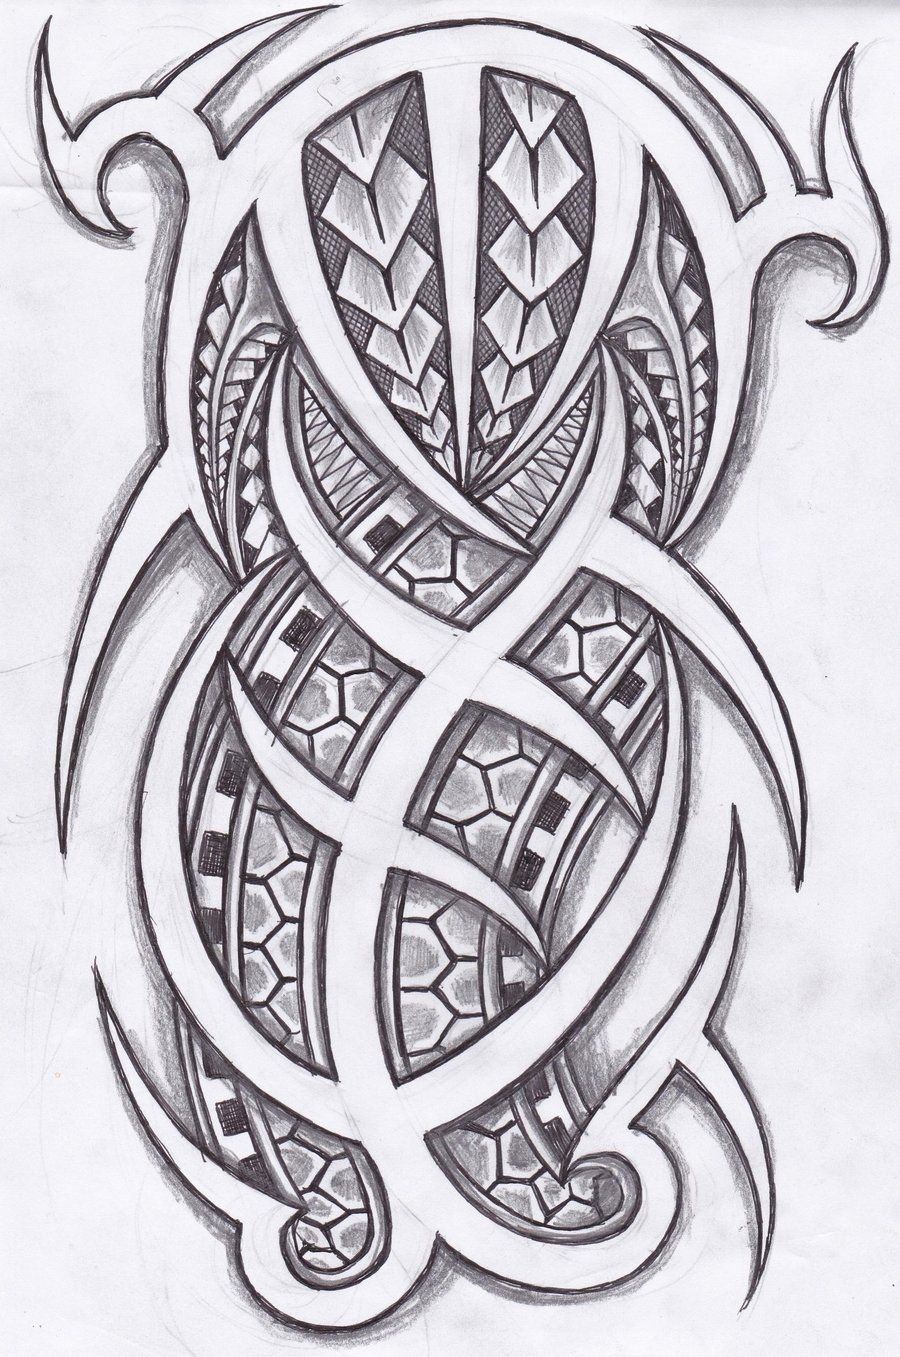 Tattoos Tribal Designs With Island Tribal Tattoo Design Stuartbrewer On Deviantart The Most Stylish Tattoos T Tribal Tattoos Maori Tattoo Tribal Tattoo Designs